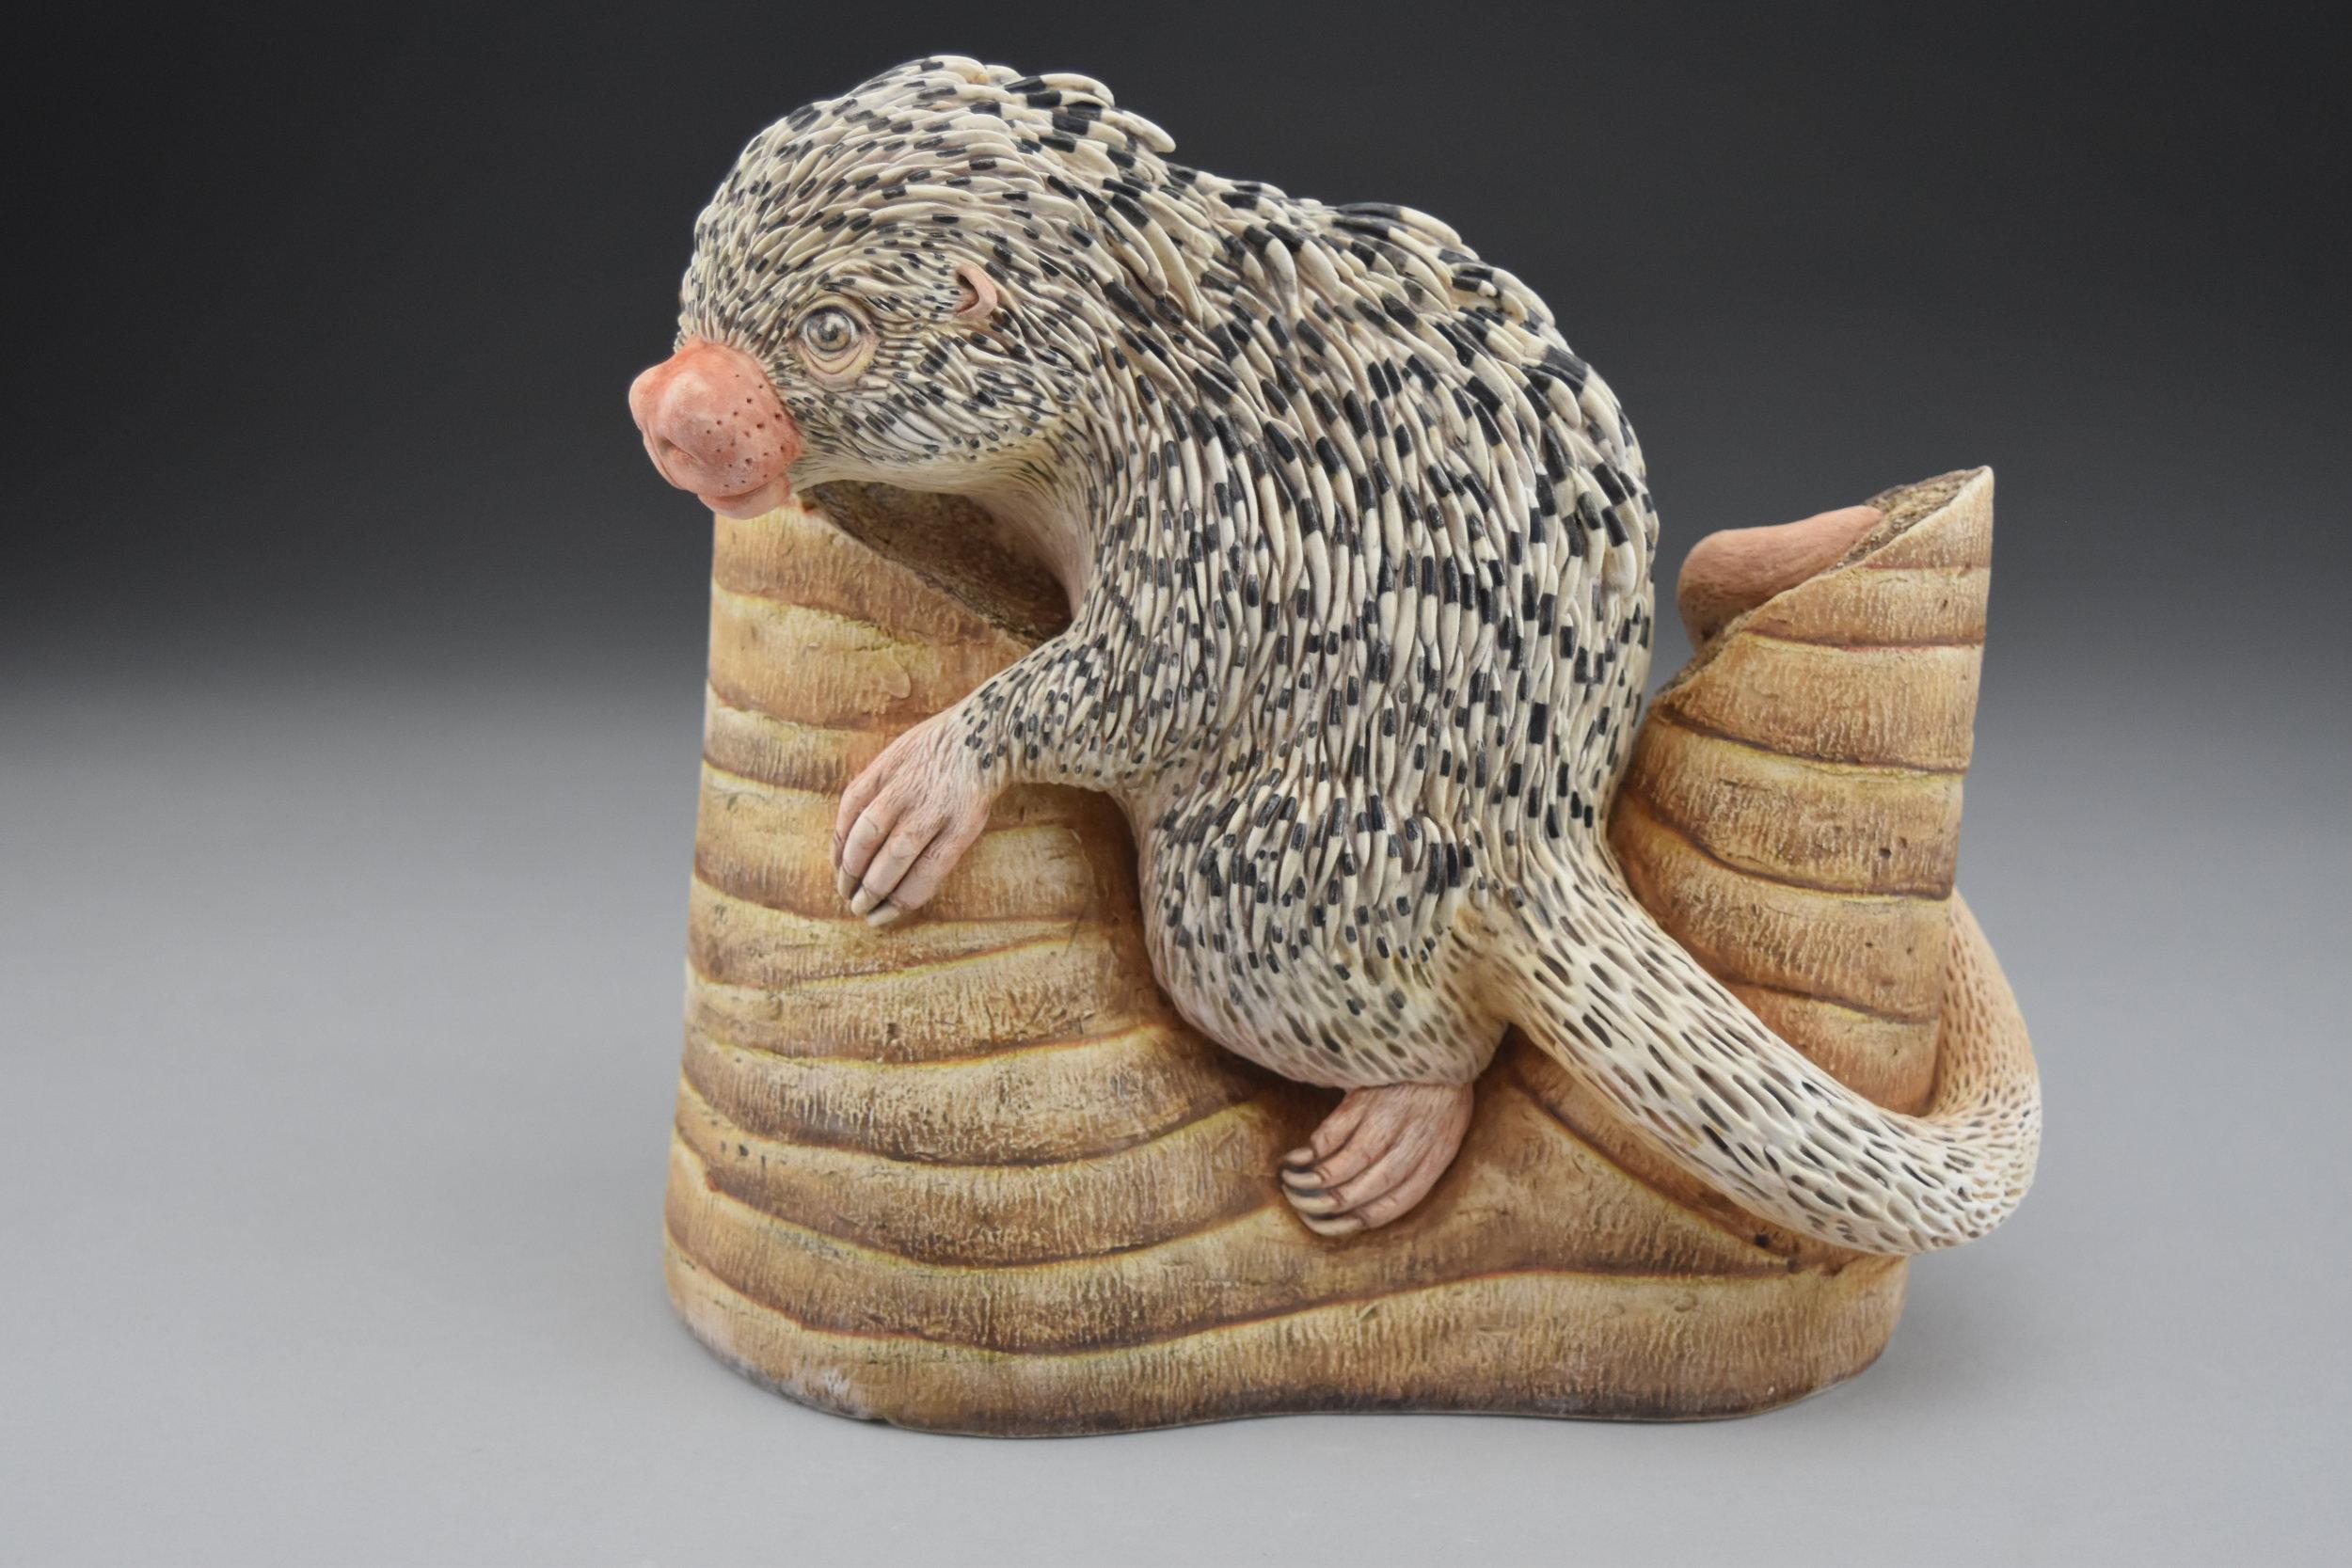 Prehensile tail porcupine